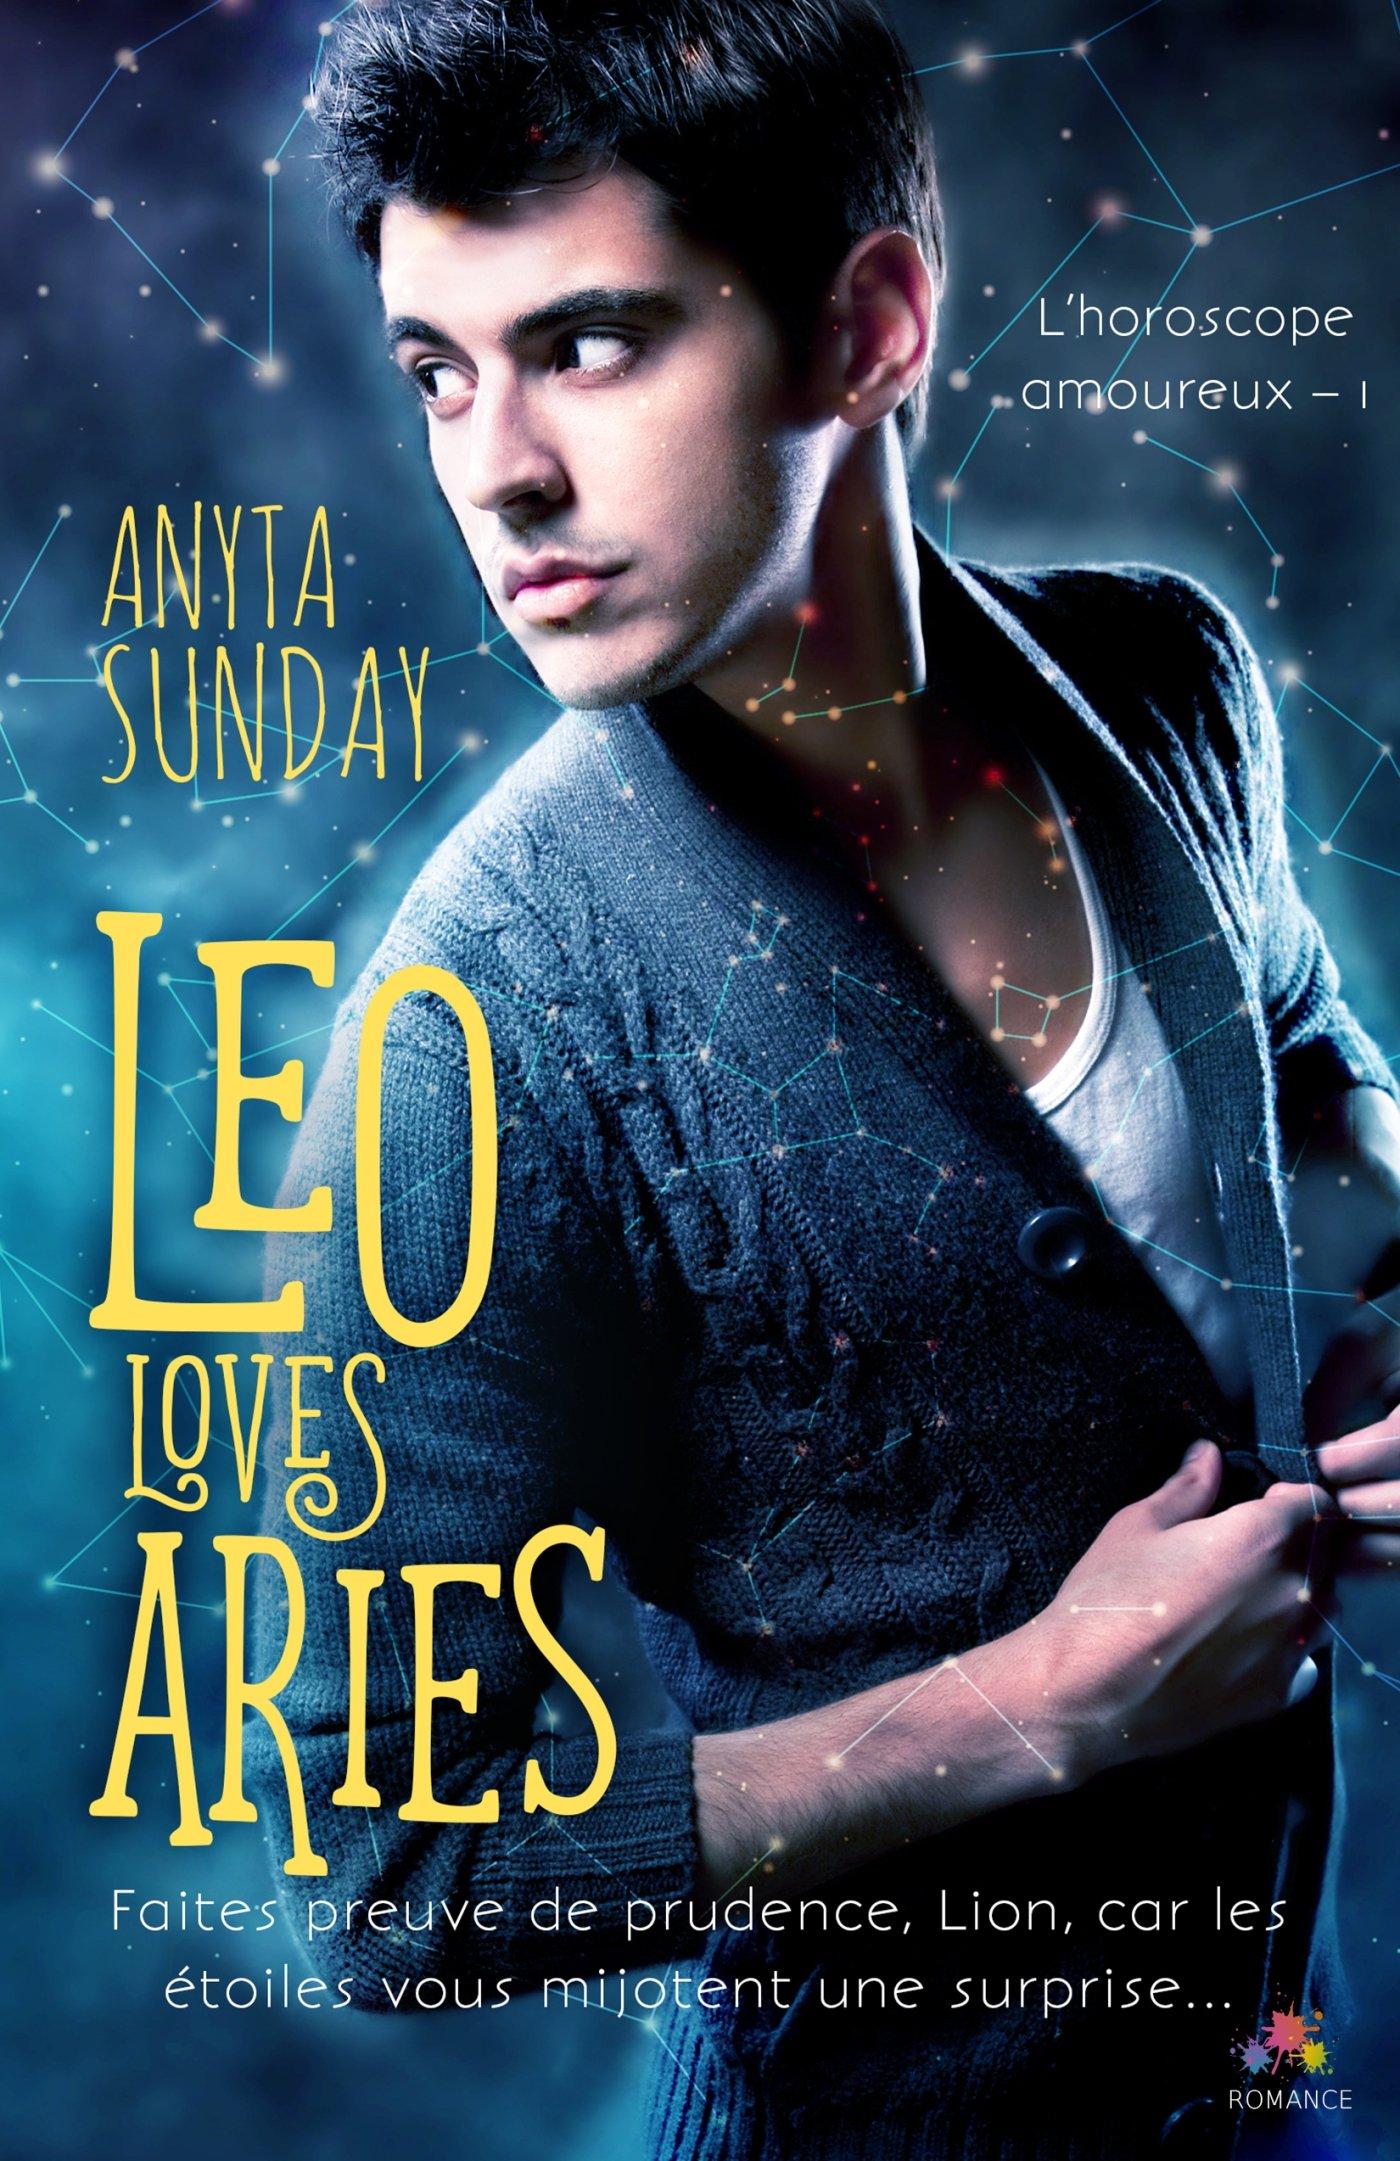 Leo Loves Aries: L'horoscope amoureux, T1 Broché – 8 novembre 2017 Anyta Sunday Mxm Bookmark 2375743024 Romans d'amour